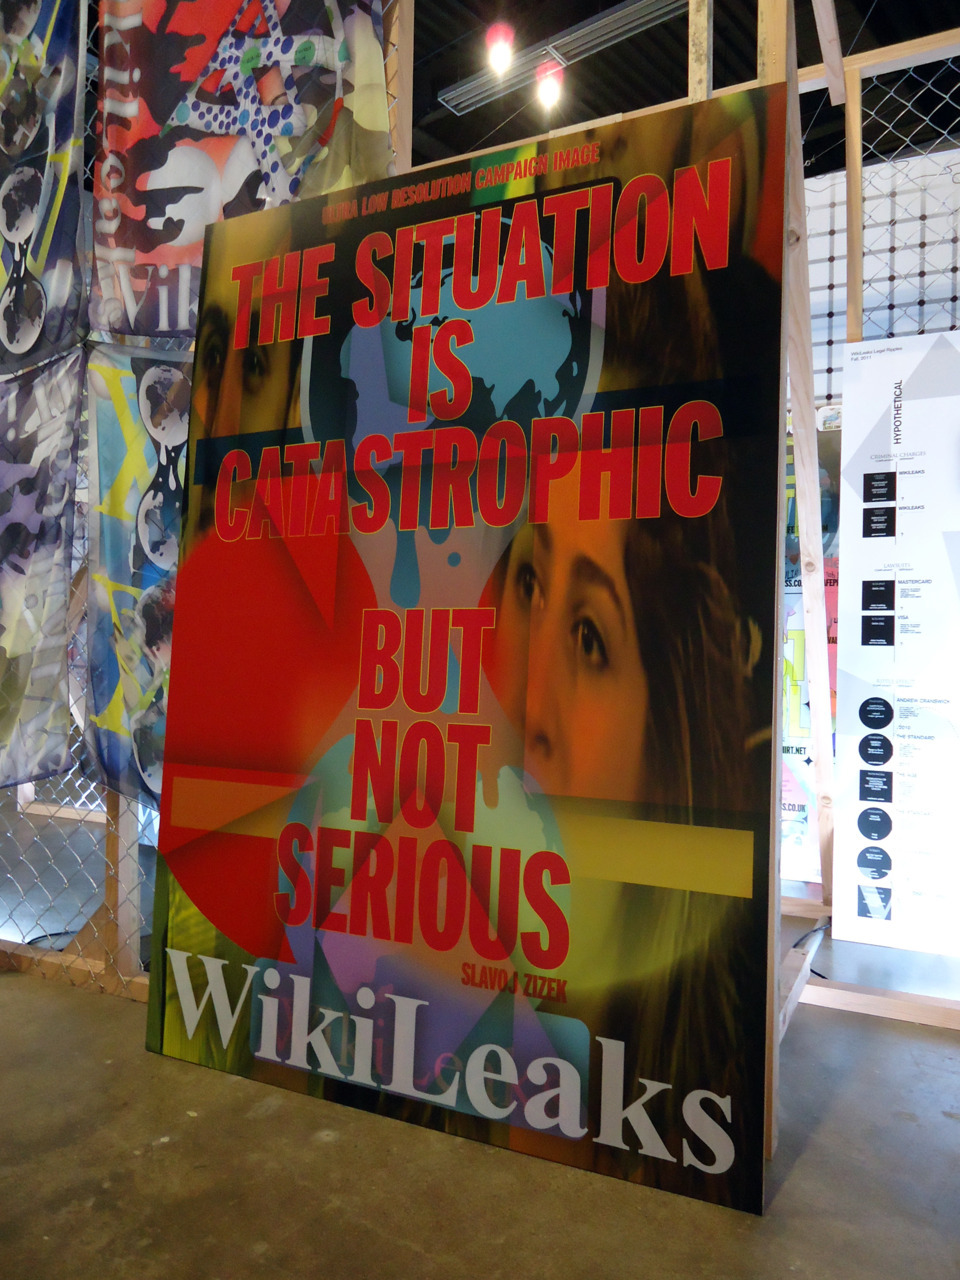 mthvn.tumblr.com/image/9924912302